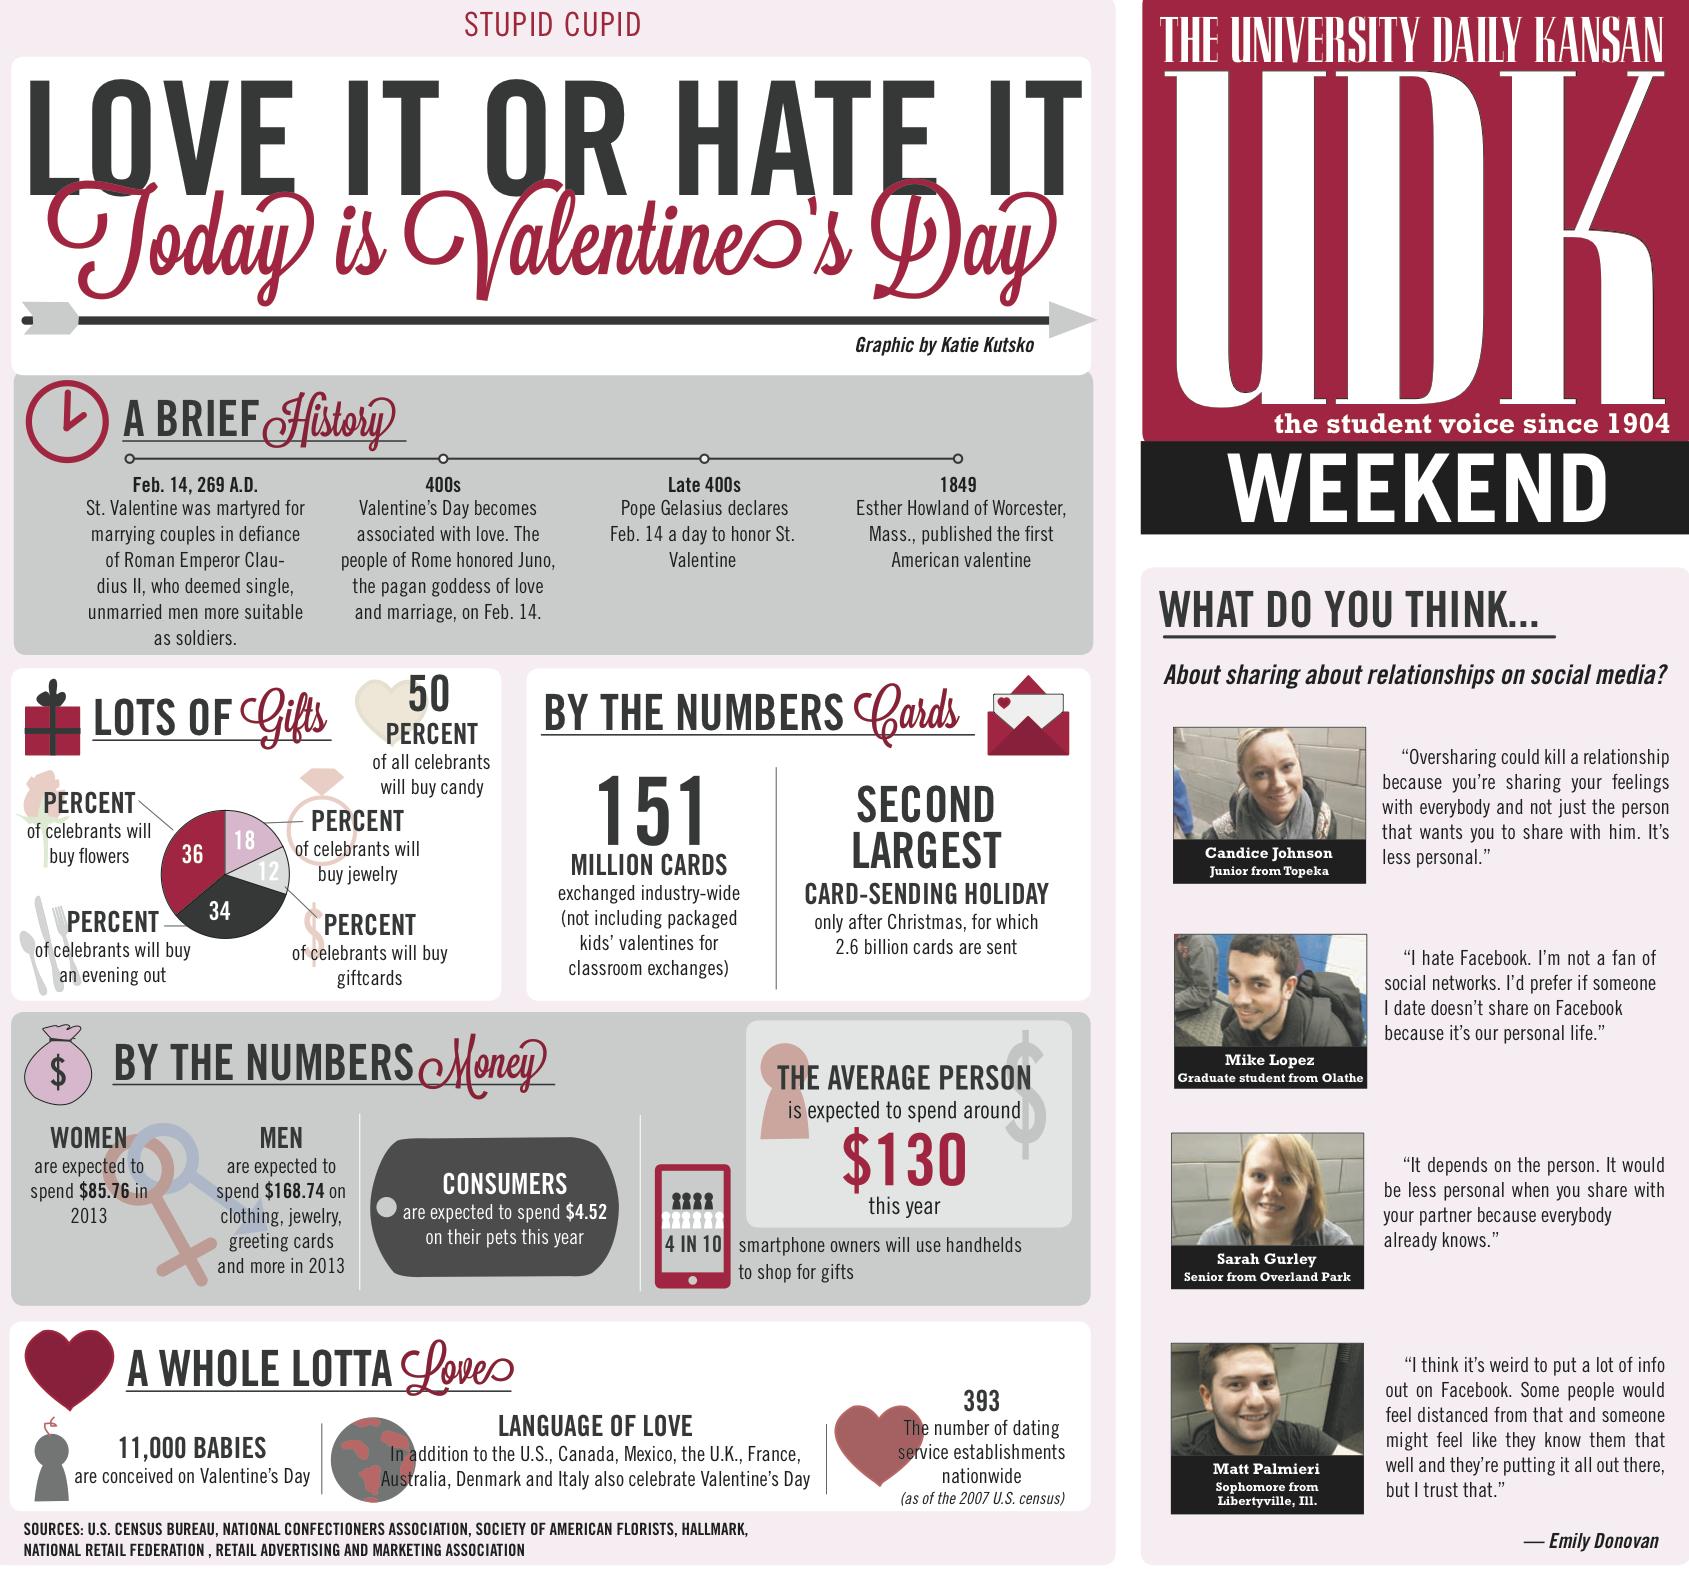 2013   Kansan information graphic about Valentine's Day